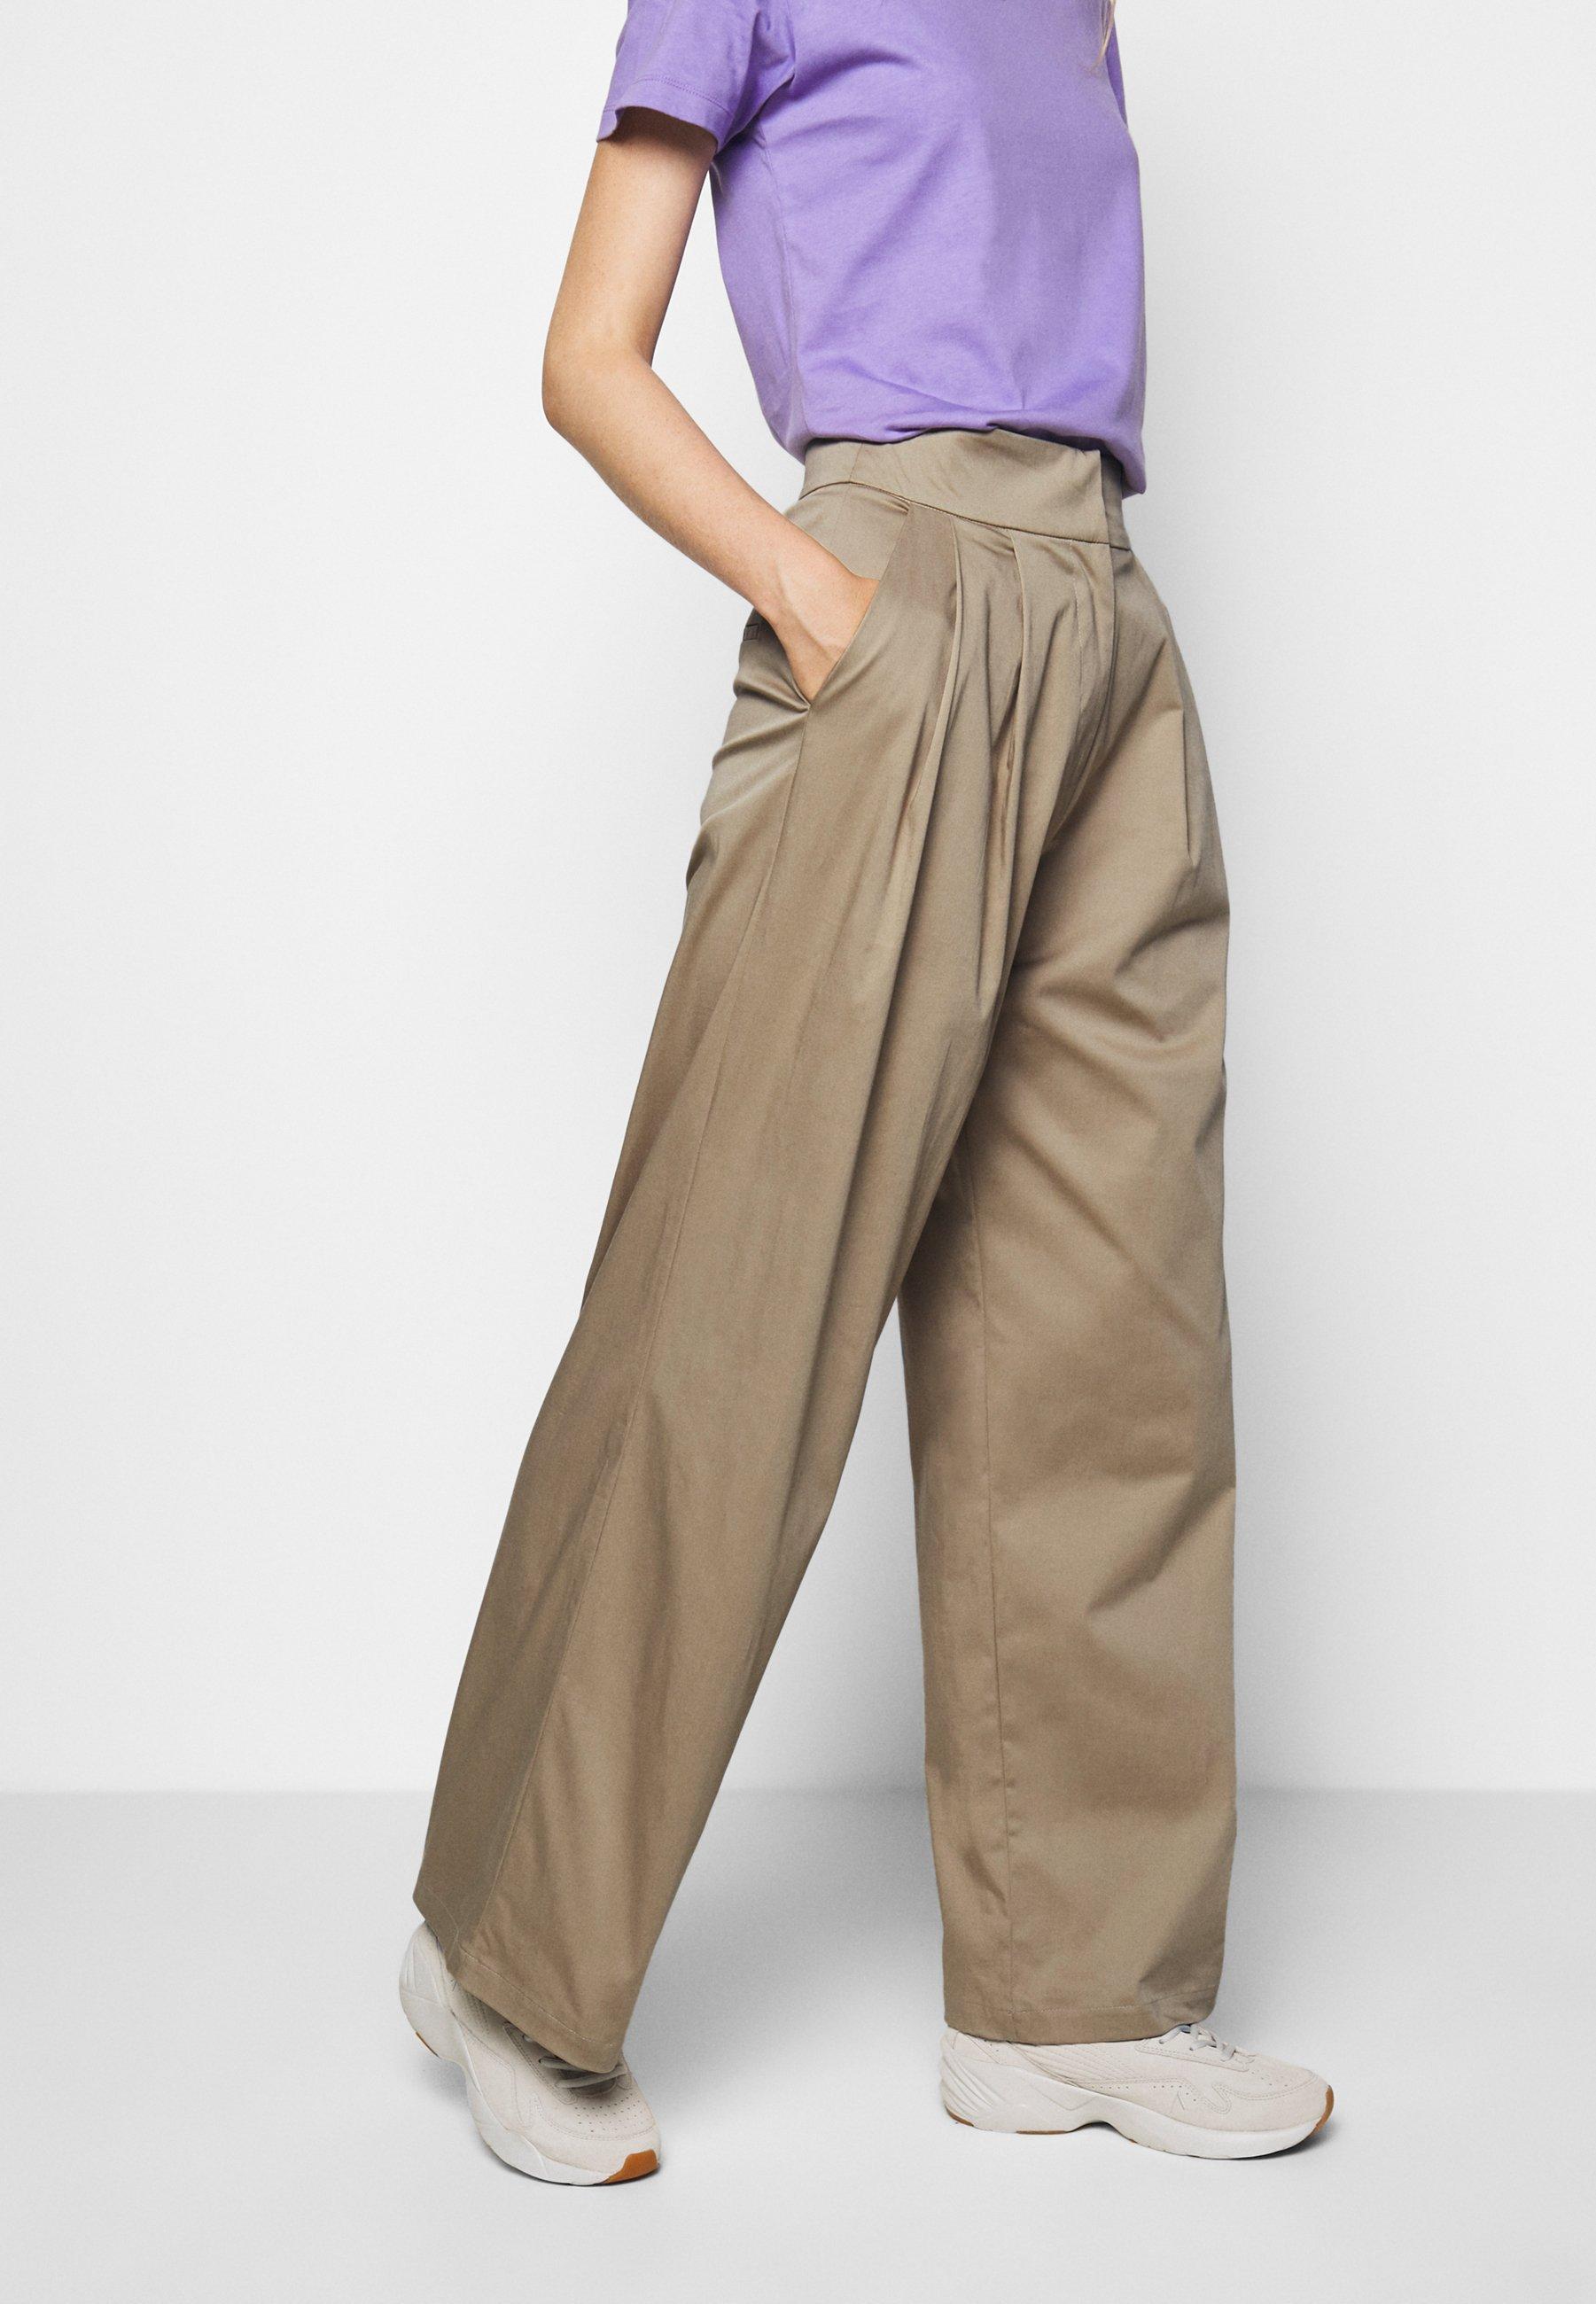 Femme HERA COSA - Pantalon classique